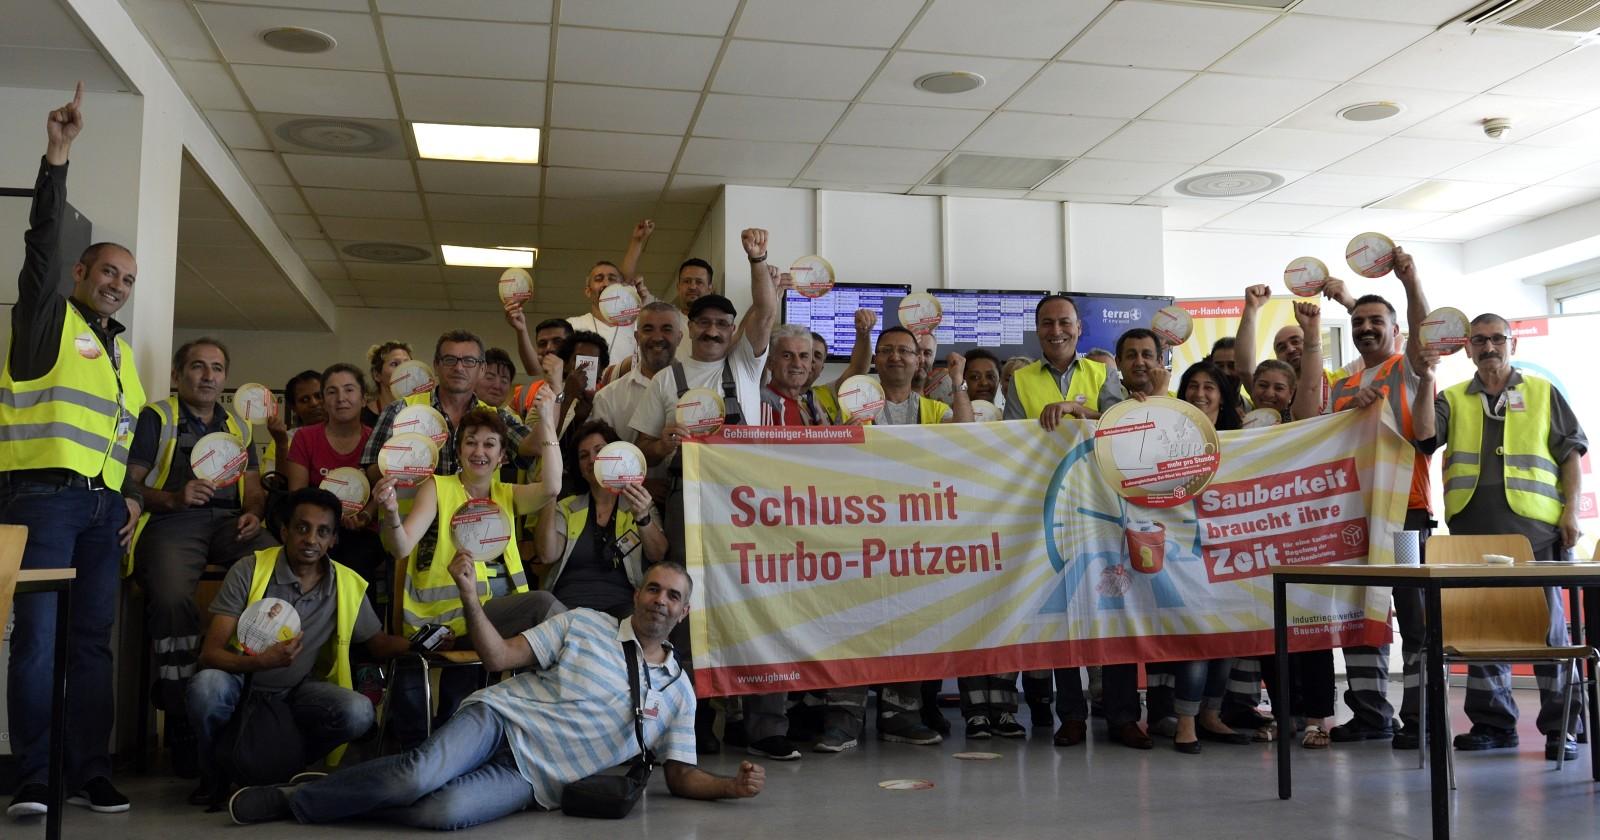 Kolleginnen & Kollegen der Firma ASG – Frankfurt Airport wünschen erfolgreiche Verhandlungen